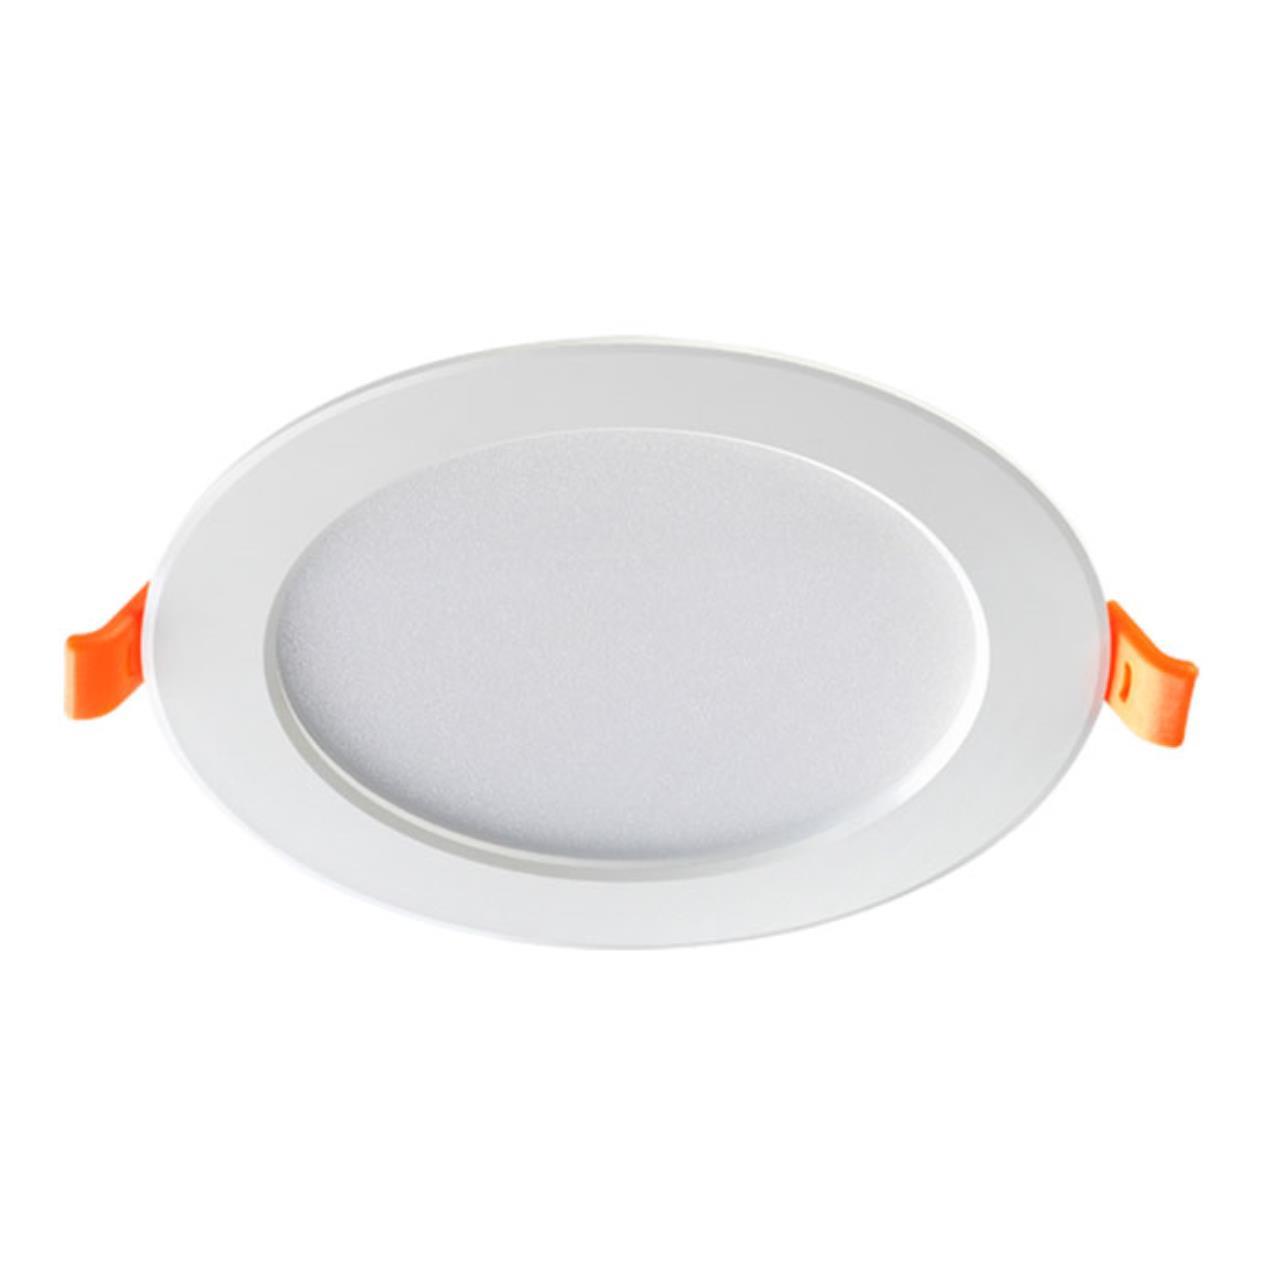 357574 SPOT NT18 079 белый Встраиваемый светильник IP20 LED 3000K 15W 175-265V LUNA